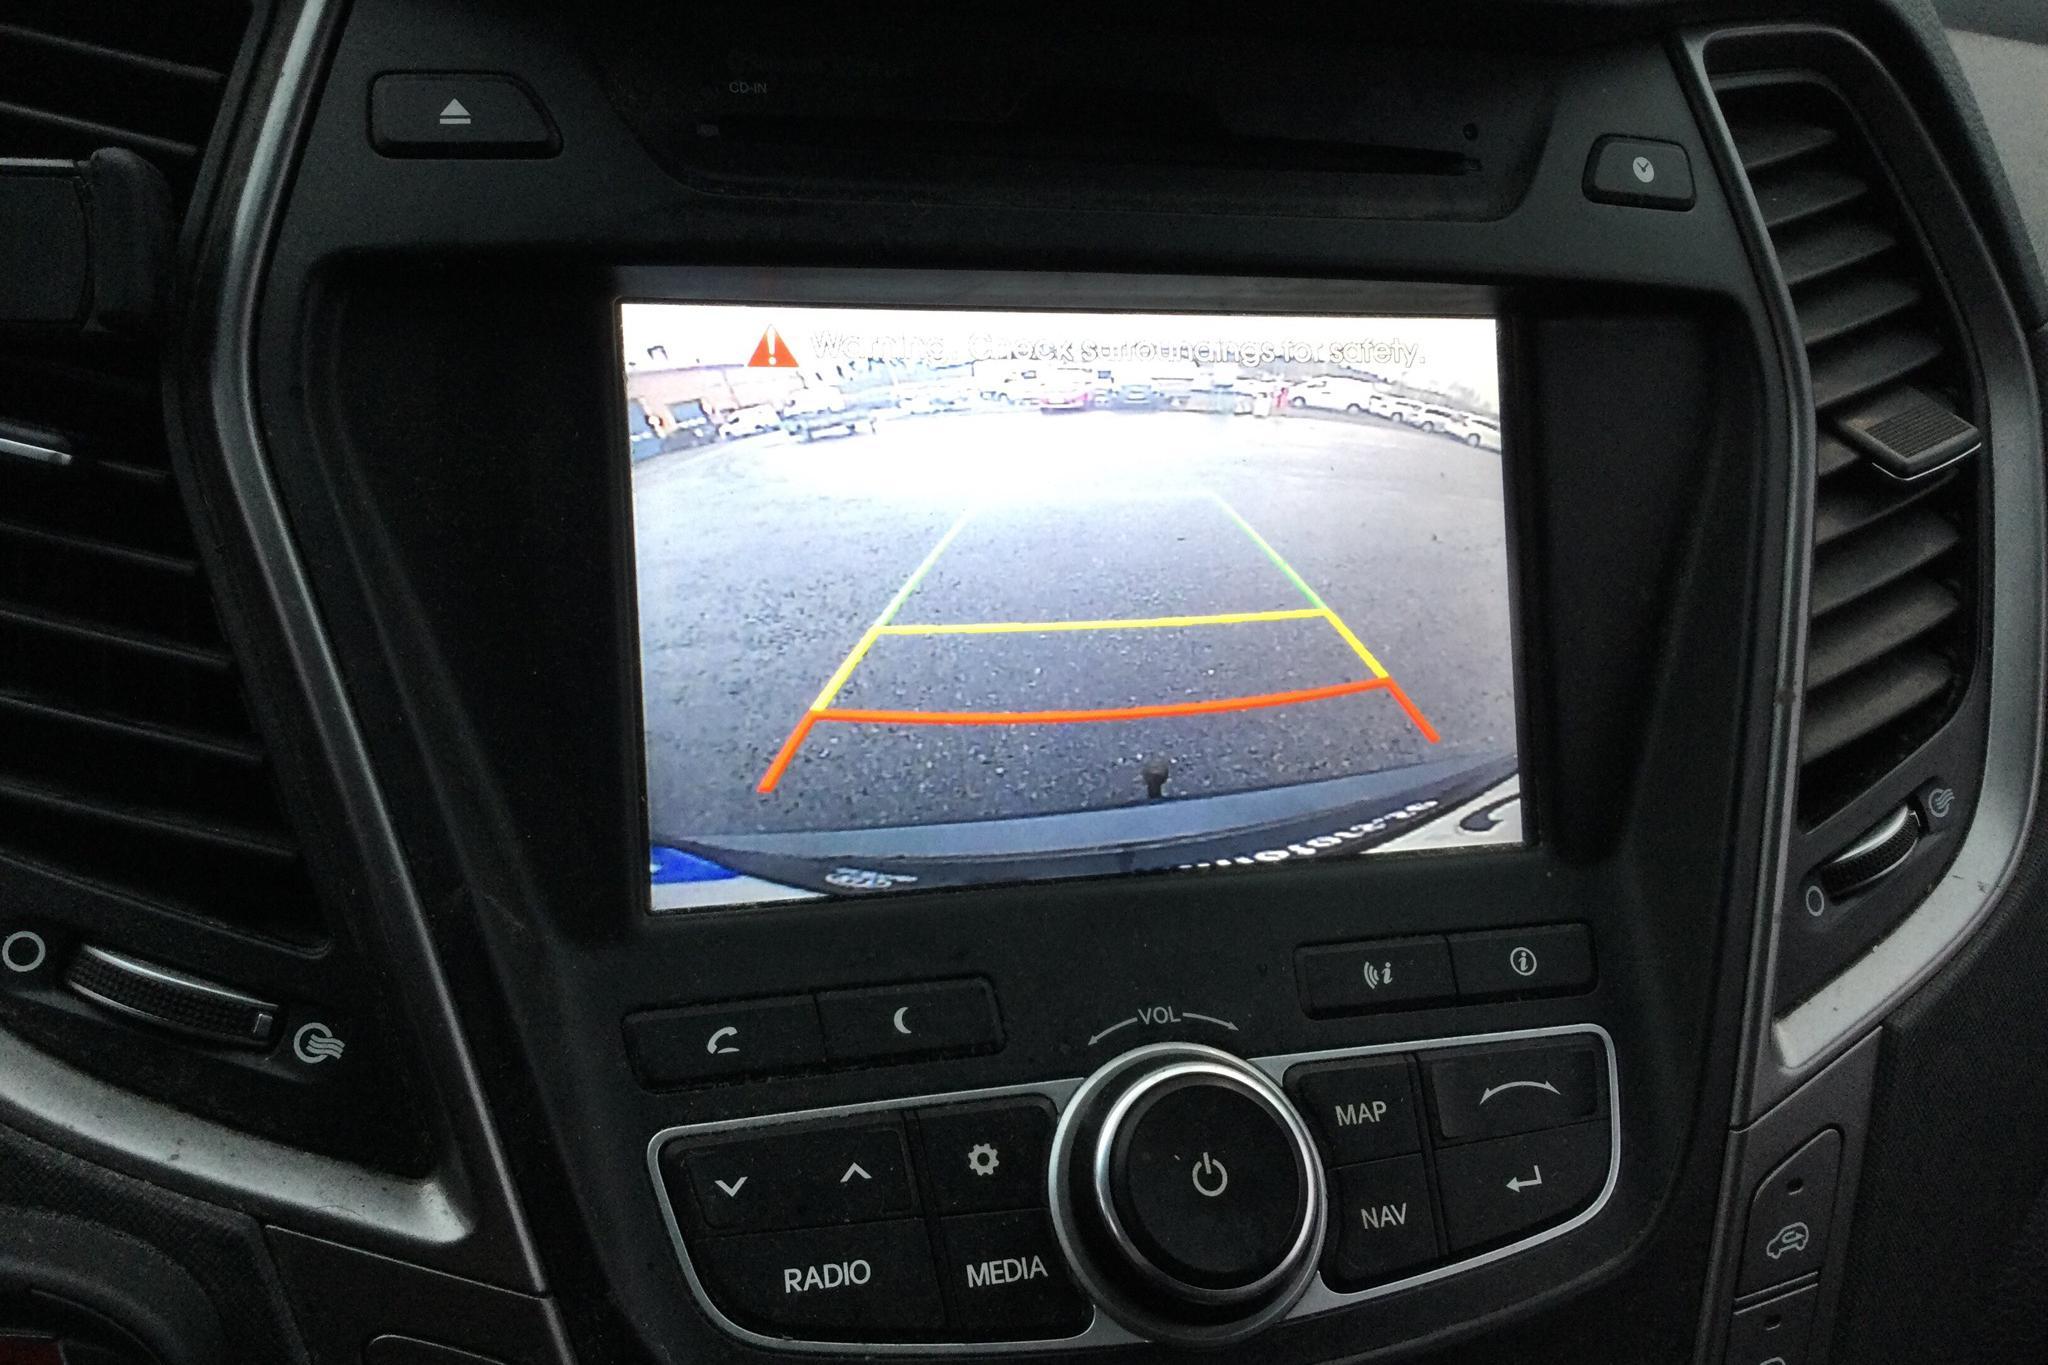 Hyundai Grand Santa Fé 2.2 CRDi-R 4WD (197hk) - 10 329 mil - Automat - Dark Green - 2014